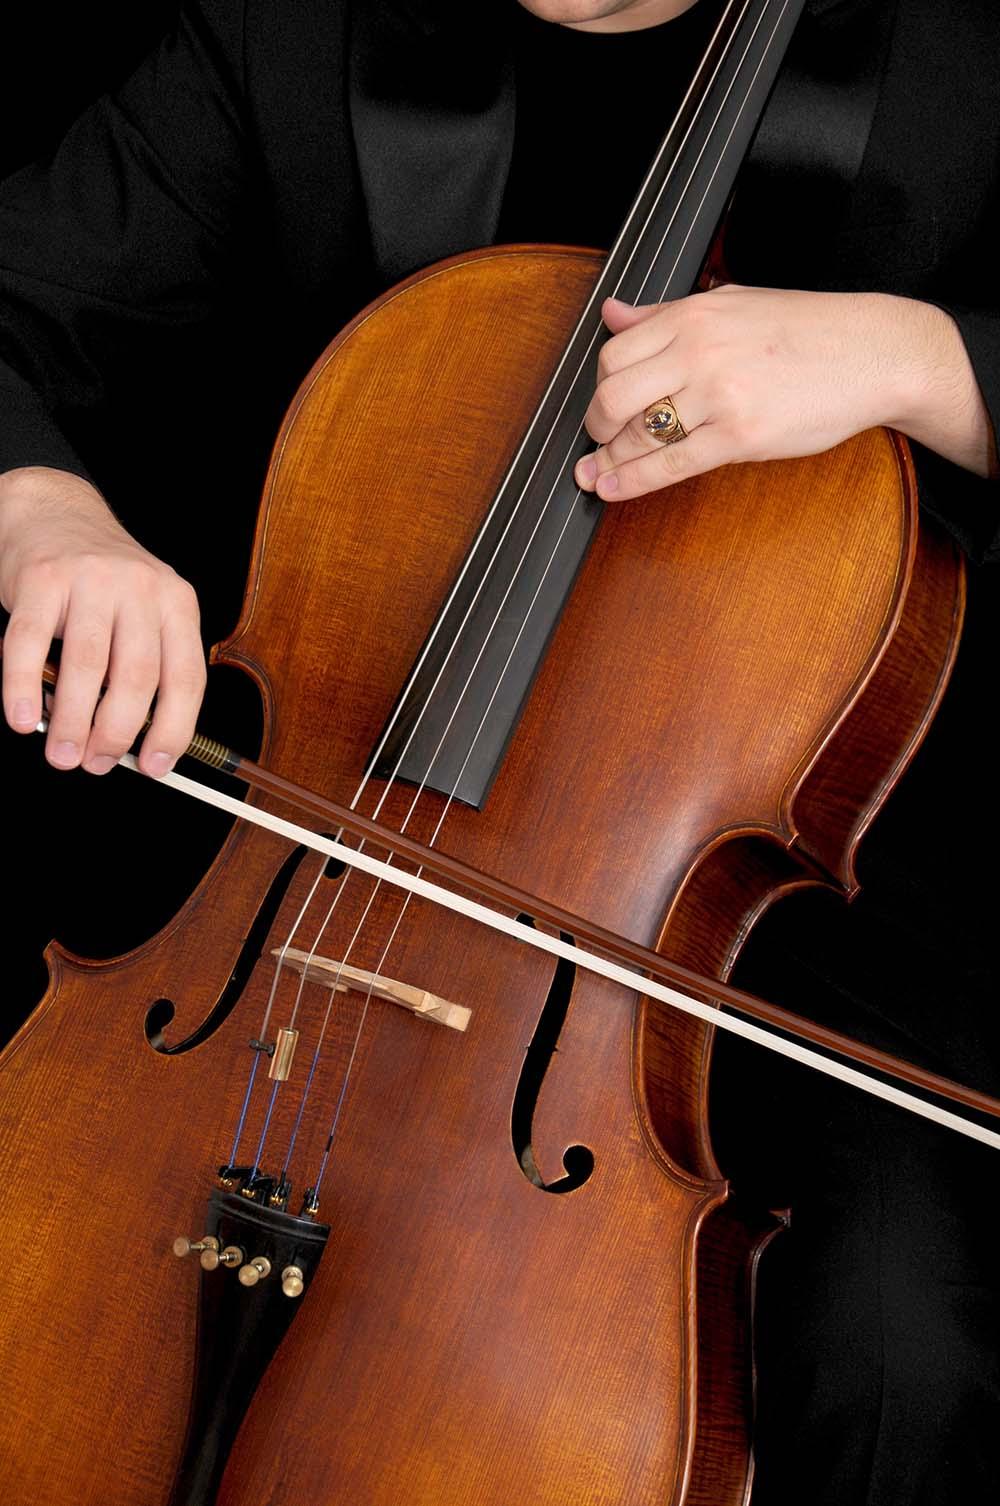 bowed-string-instrument-cello-cello-bow-462510